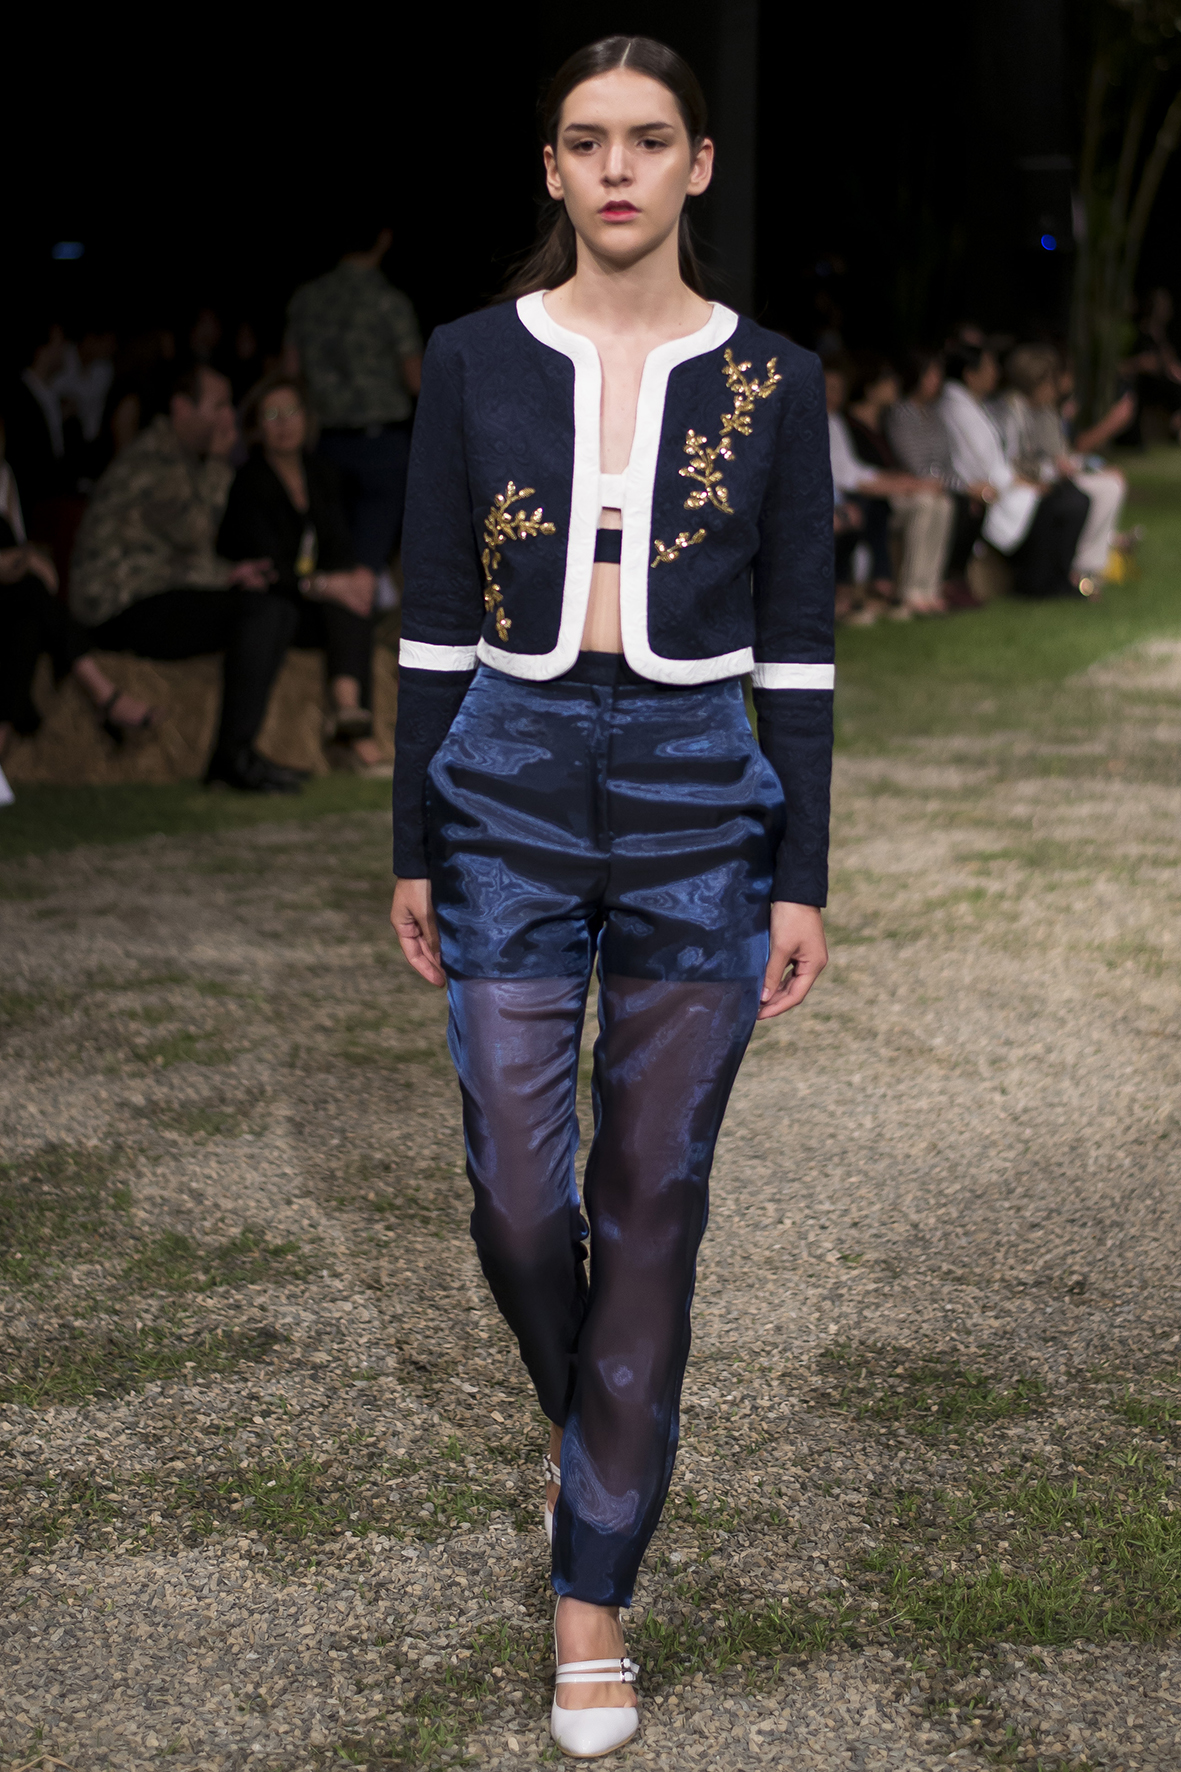 It Project evolet den tavara ceam enrique canales delrieu carolina tola eriko peru fashion moda peruana -  06.JPG